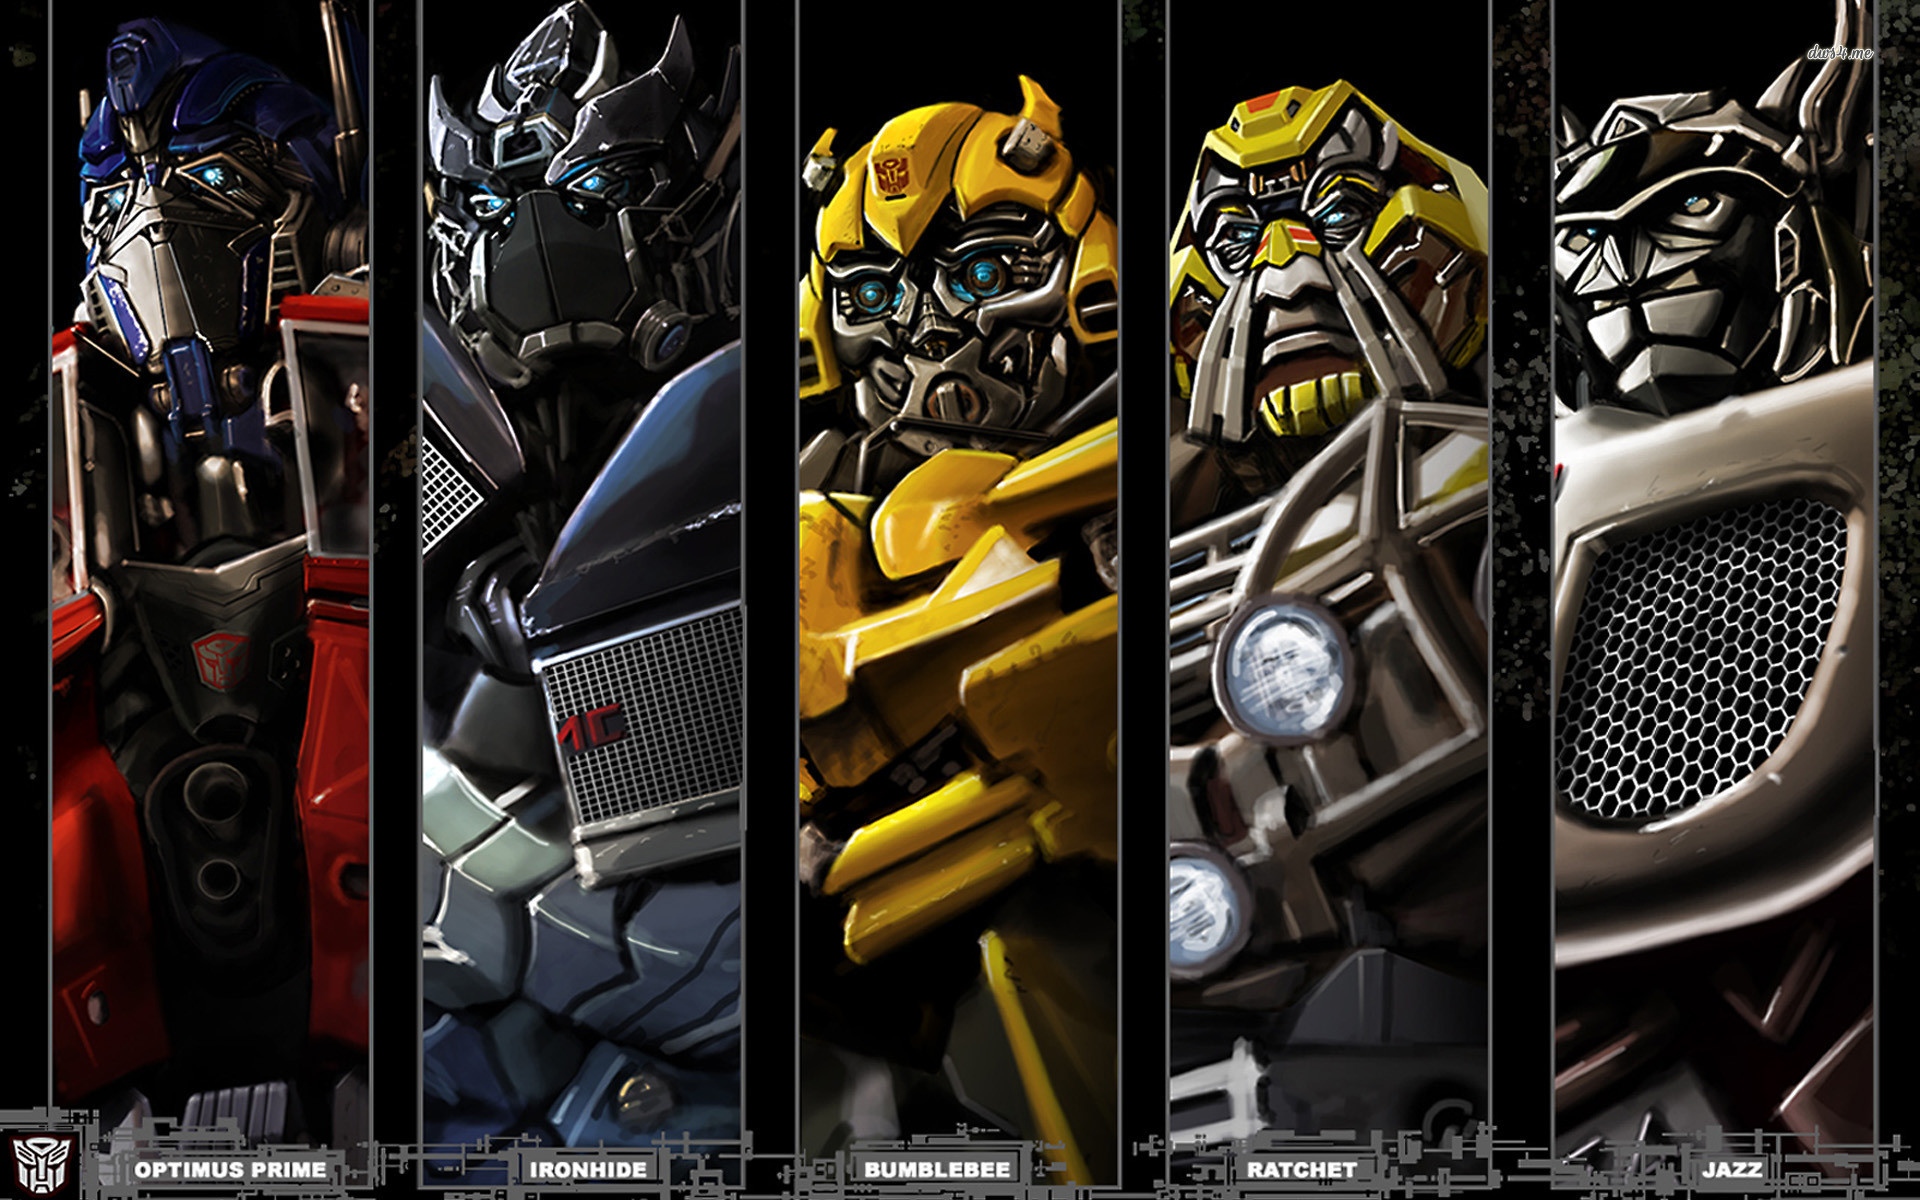 Res: 1920x1200, ... Optimus Prime, Ironhide, Bumblebee, Ratchet, Jazz wallpaper   ...